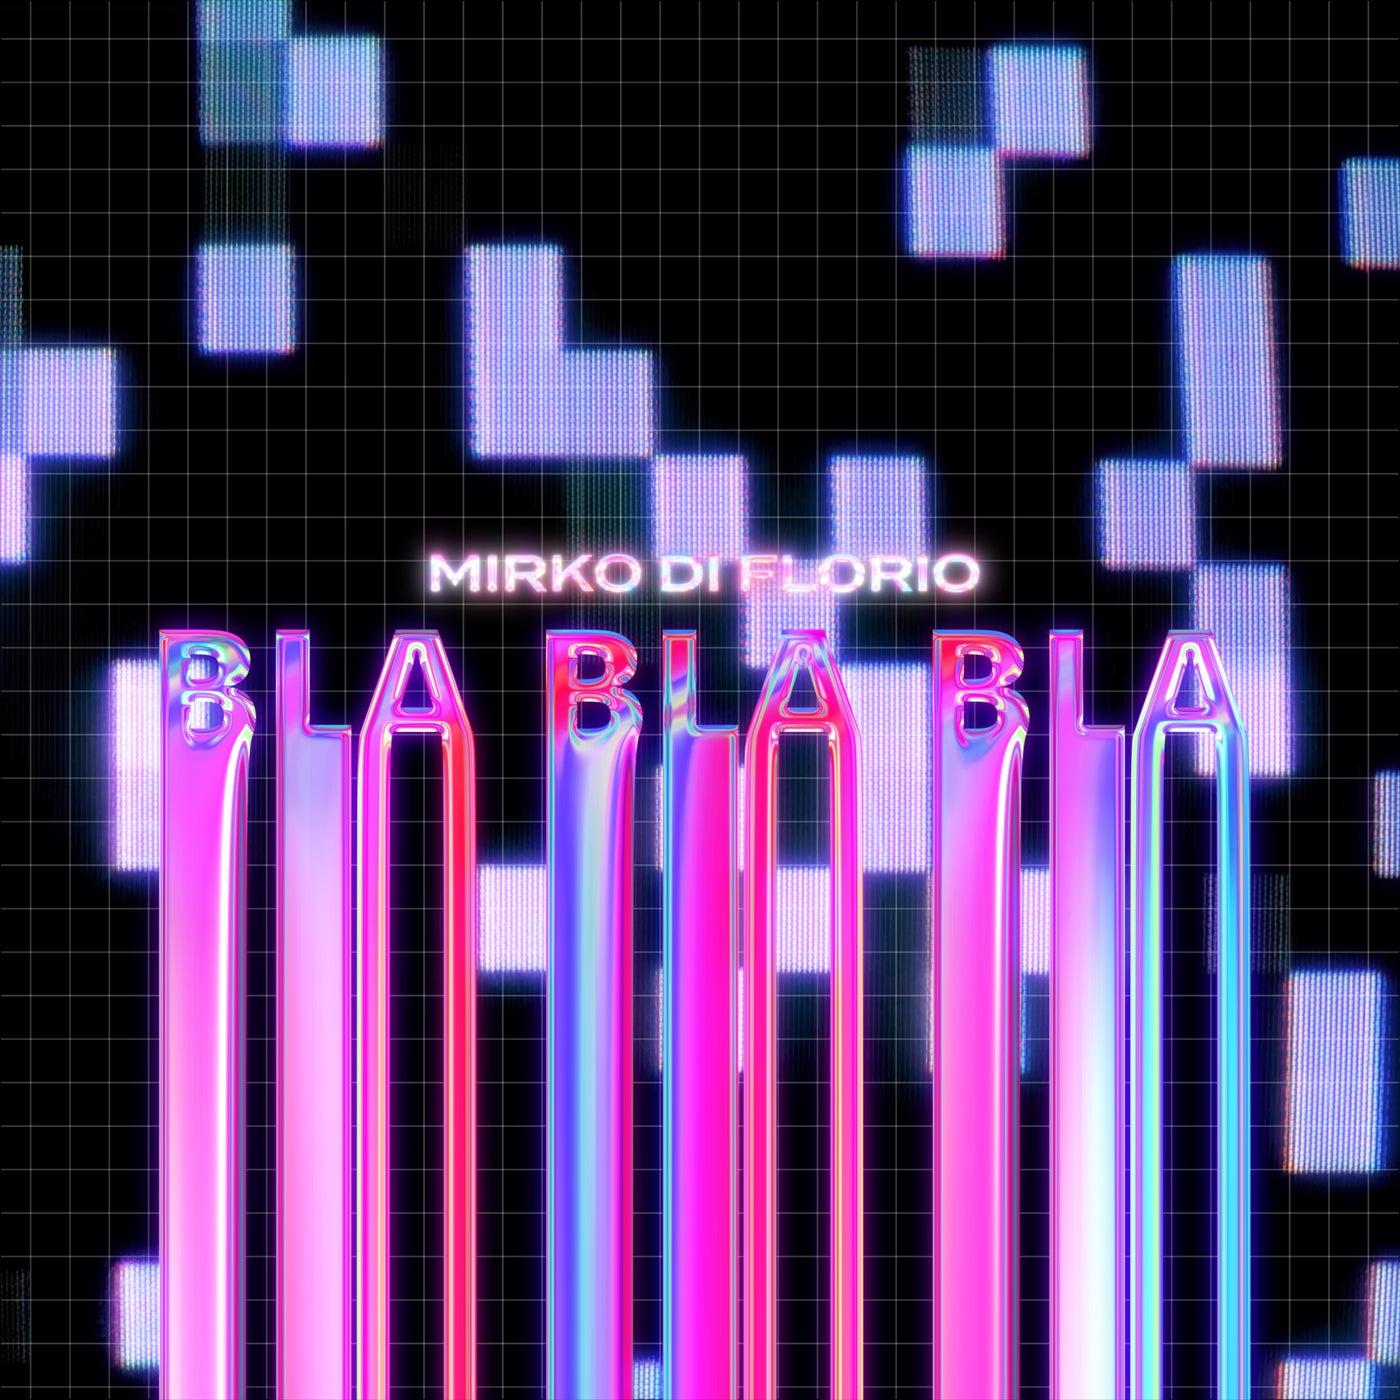 Bla Bla Bla (Extended Mix)